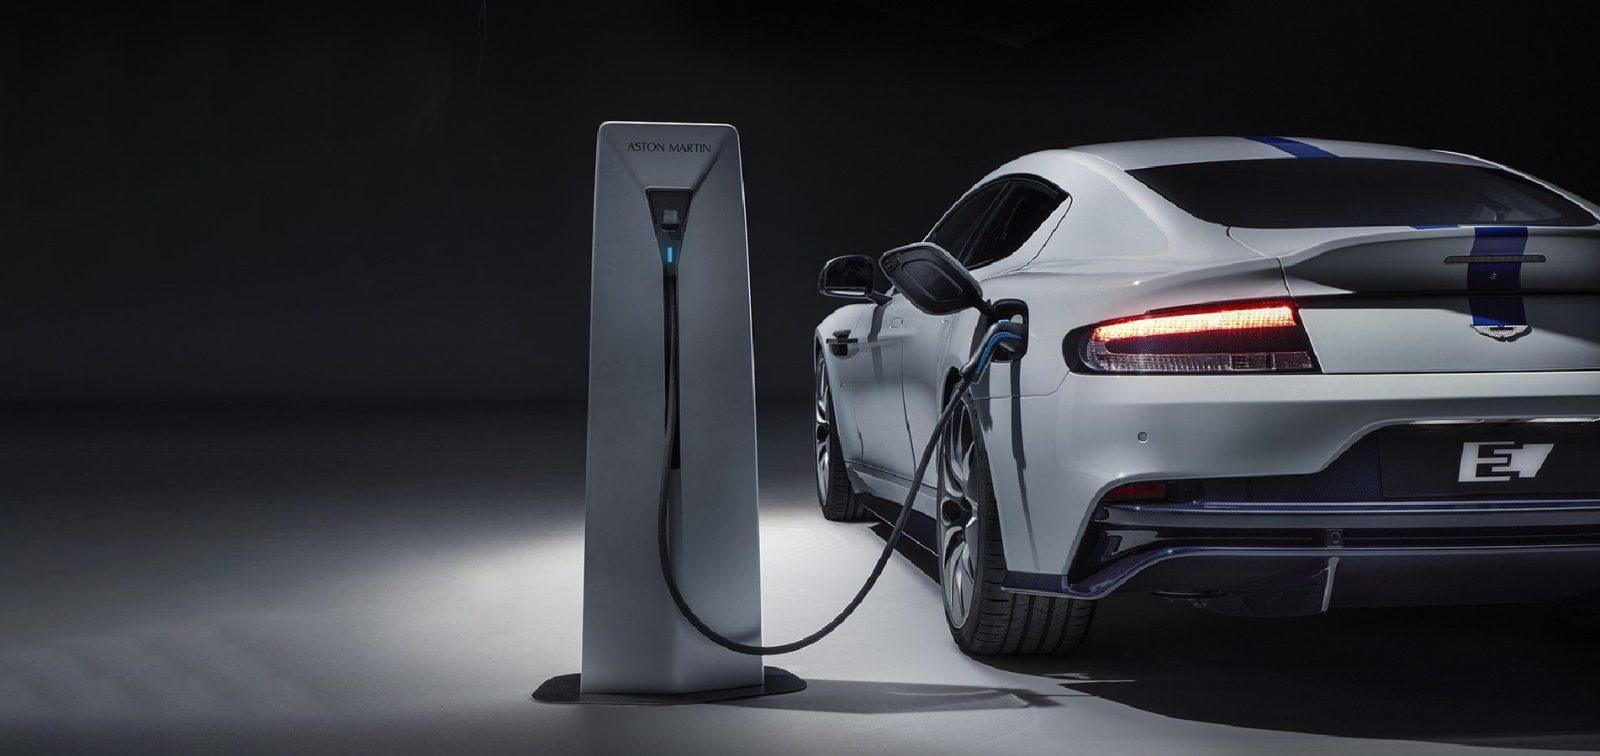 Aston Martin reportedly kills Rapide-E electric car program